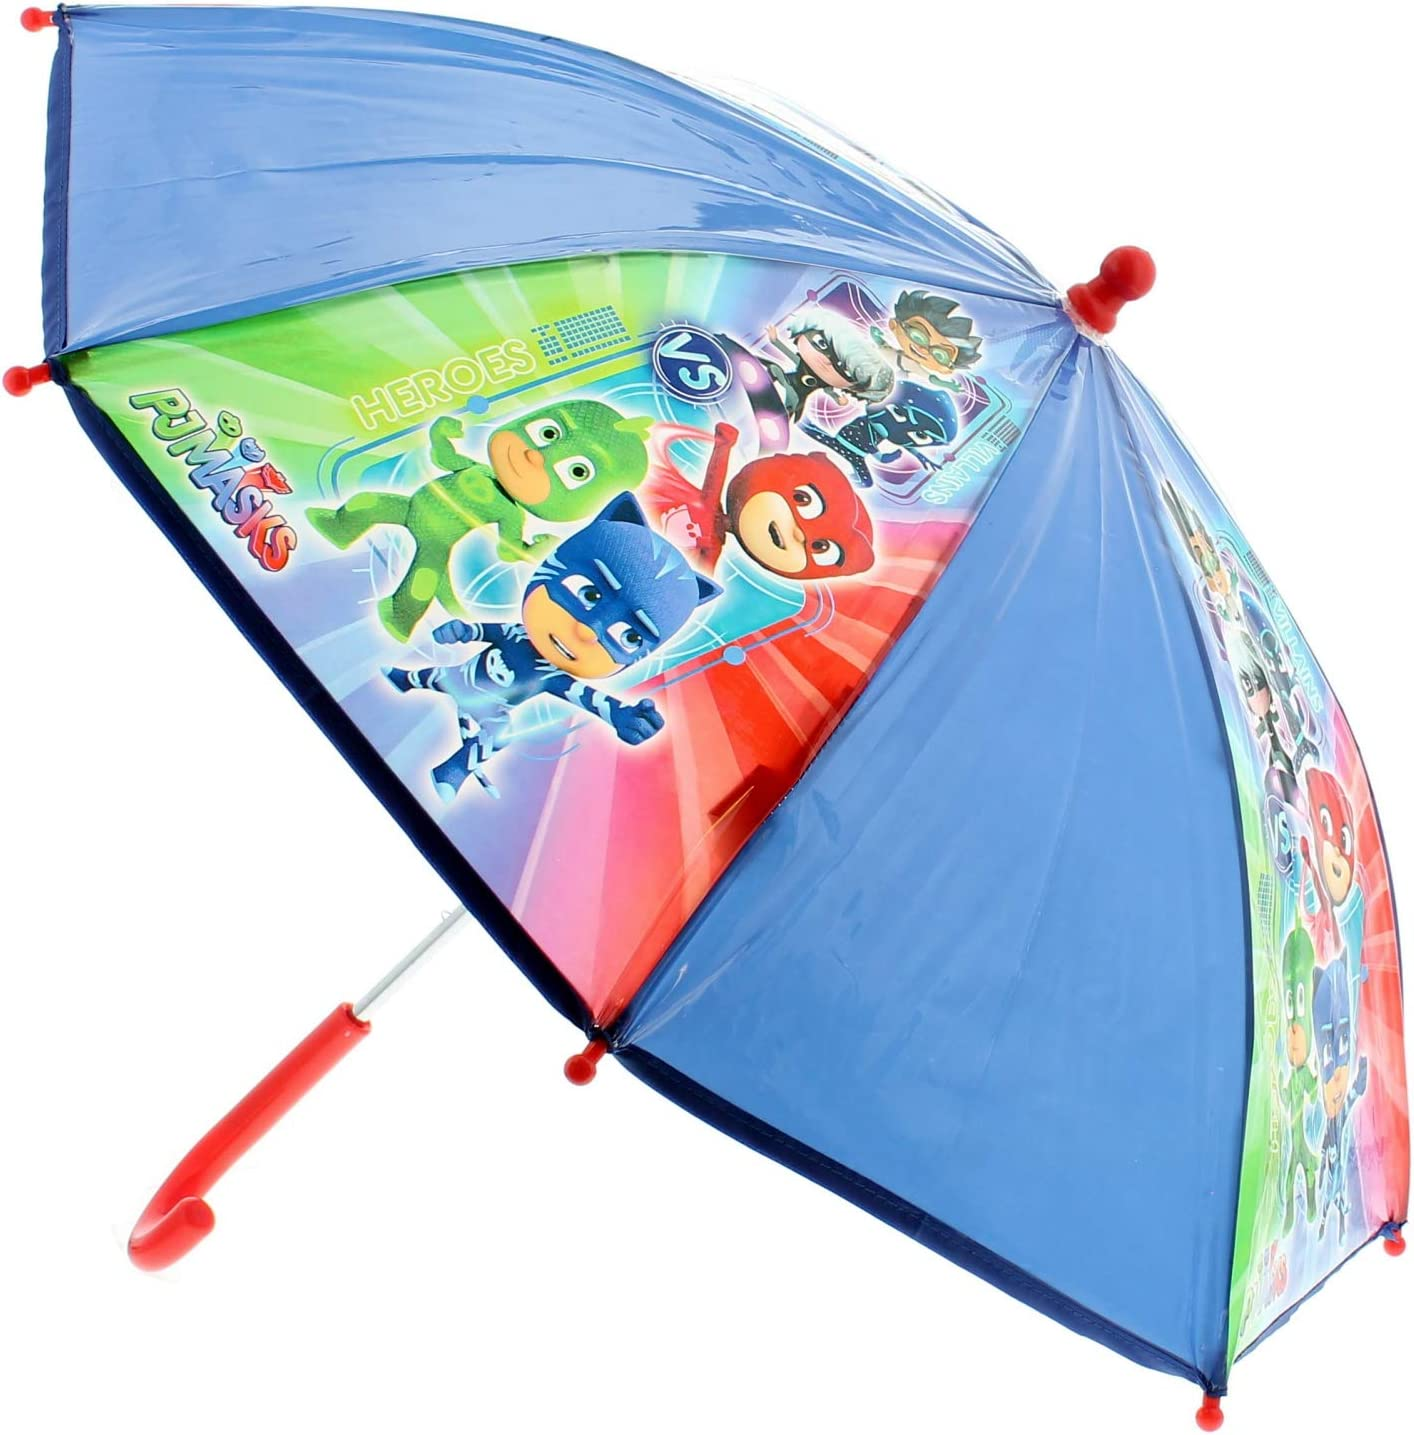 PJ Masks Its Time to be Hero Kids Umbrella